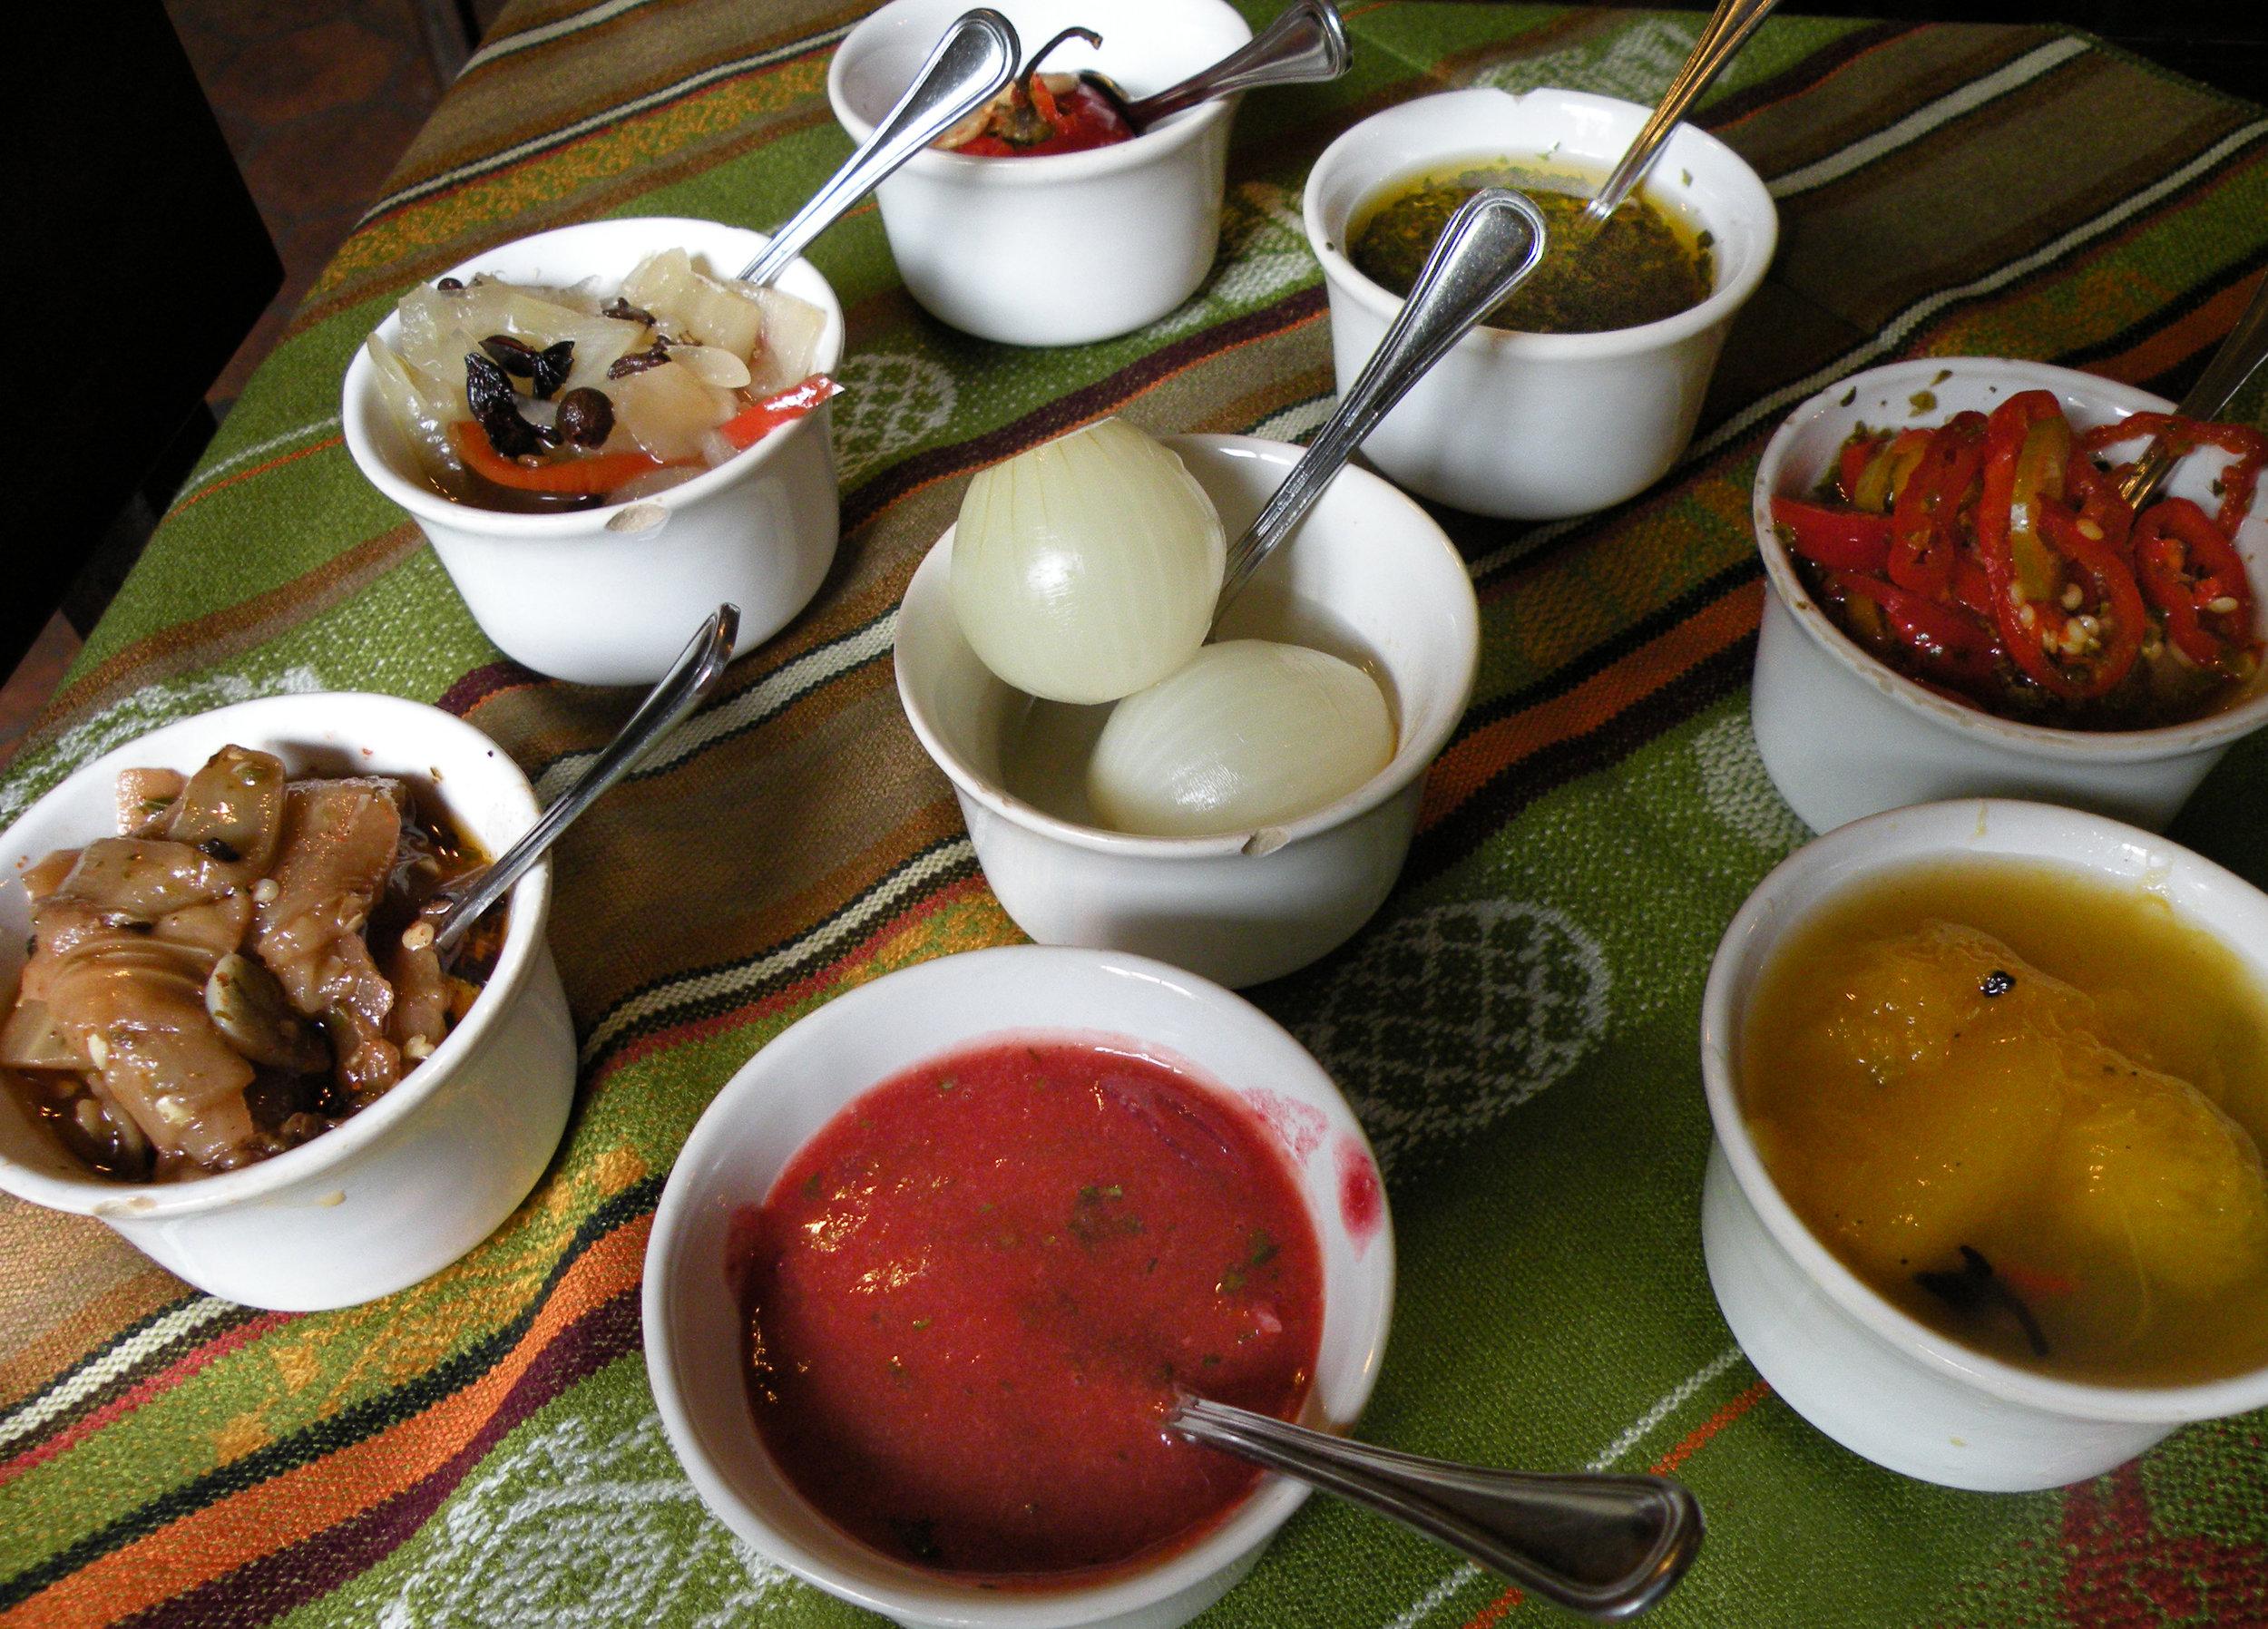 Salsas and condiments at Tiestos